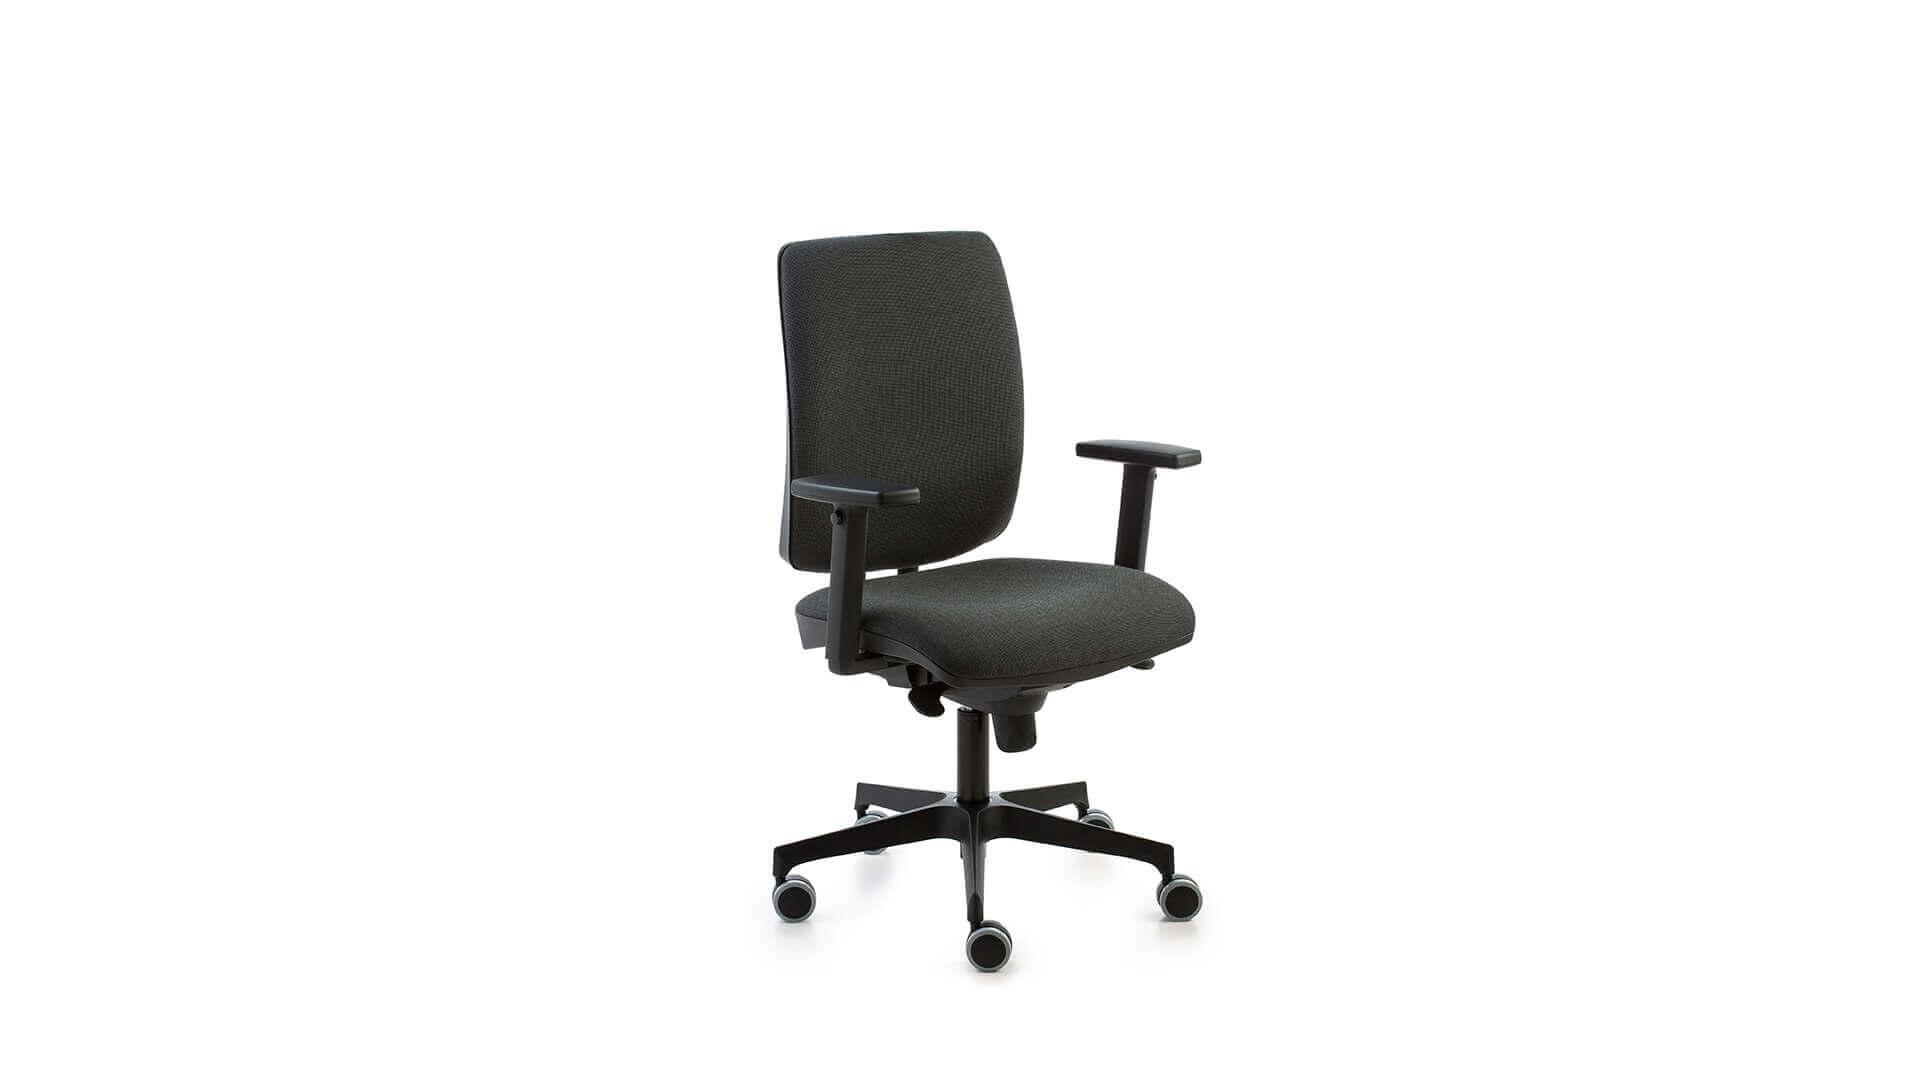 Silla para escritorios en oficinas adaptable